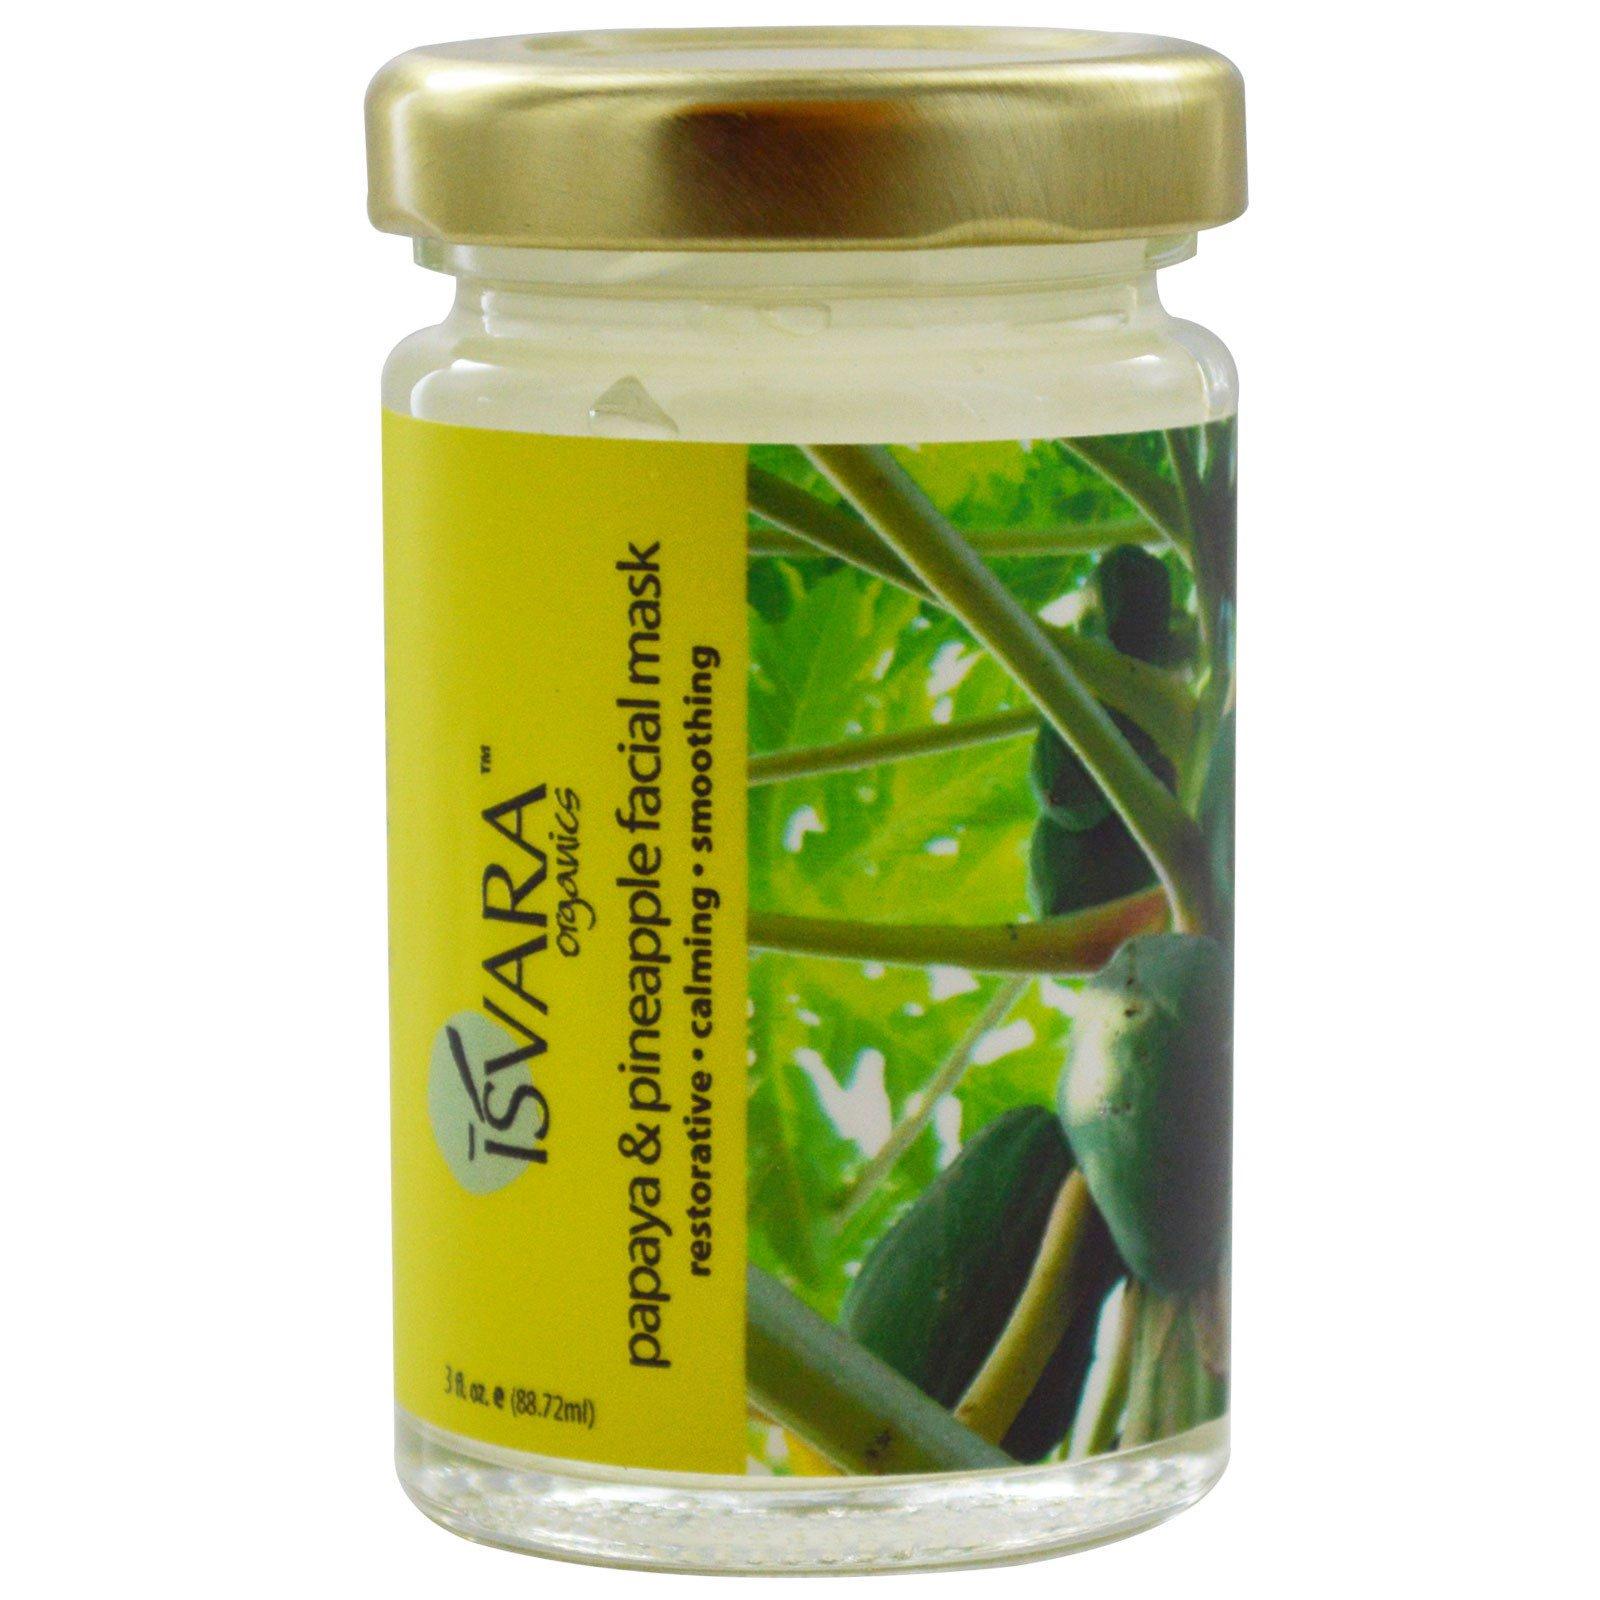 Isvara Organics, Clear Skin Facial Mask, 3 fl oz ((pack of 4) Elaine Gregg Dermaclenz Liquid Cleanser